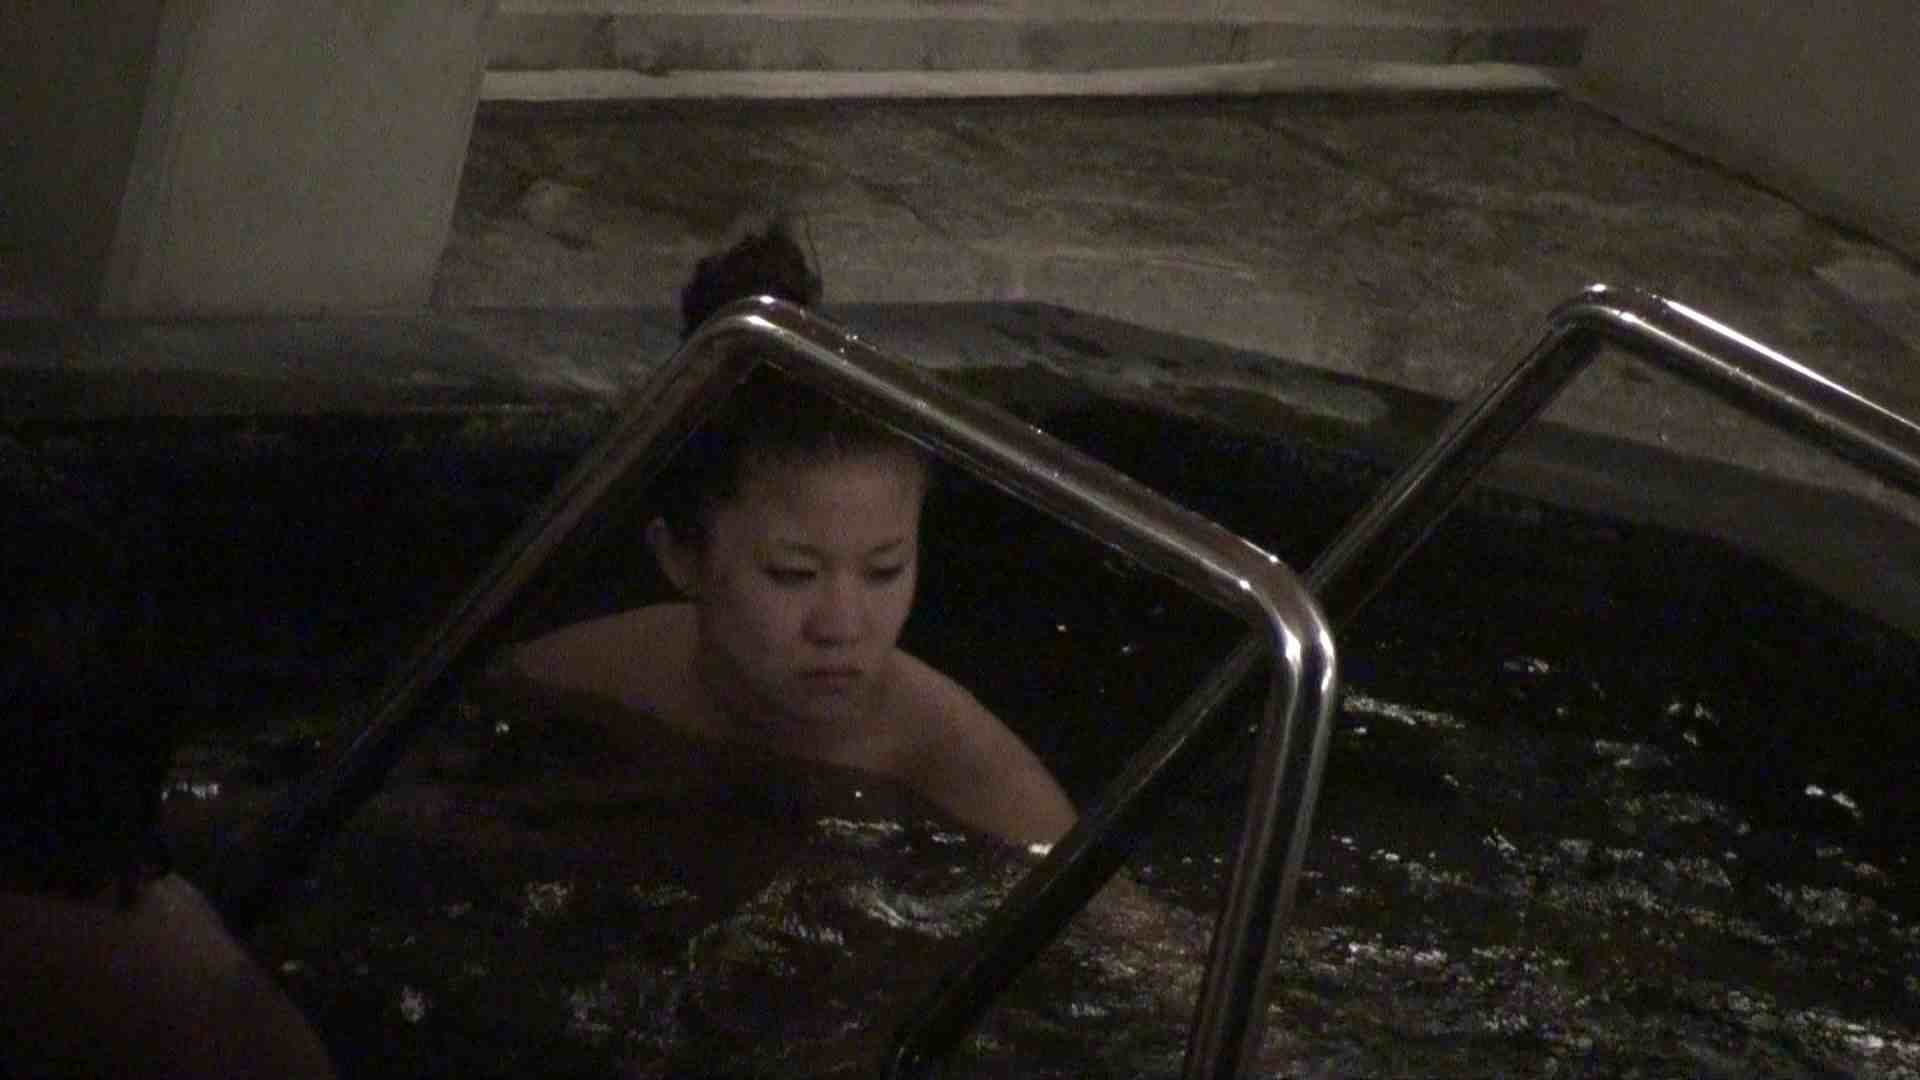 Aquaな露天風呂Vol.378 0   0  88連発 43